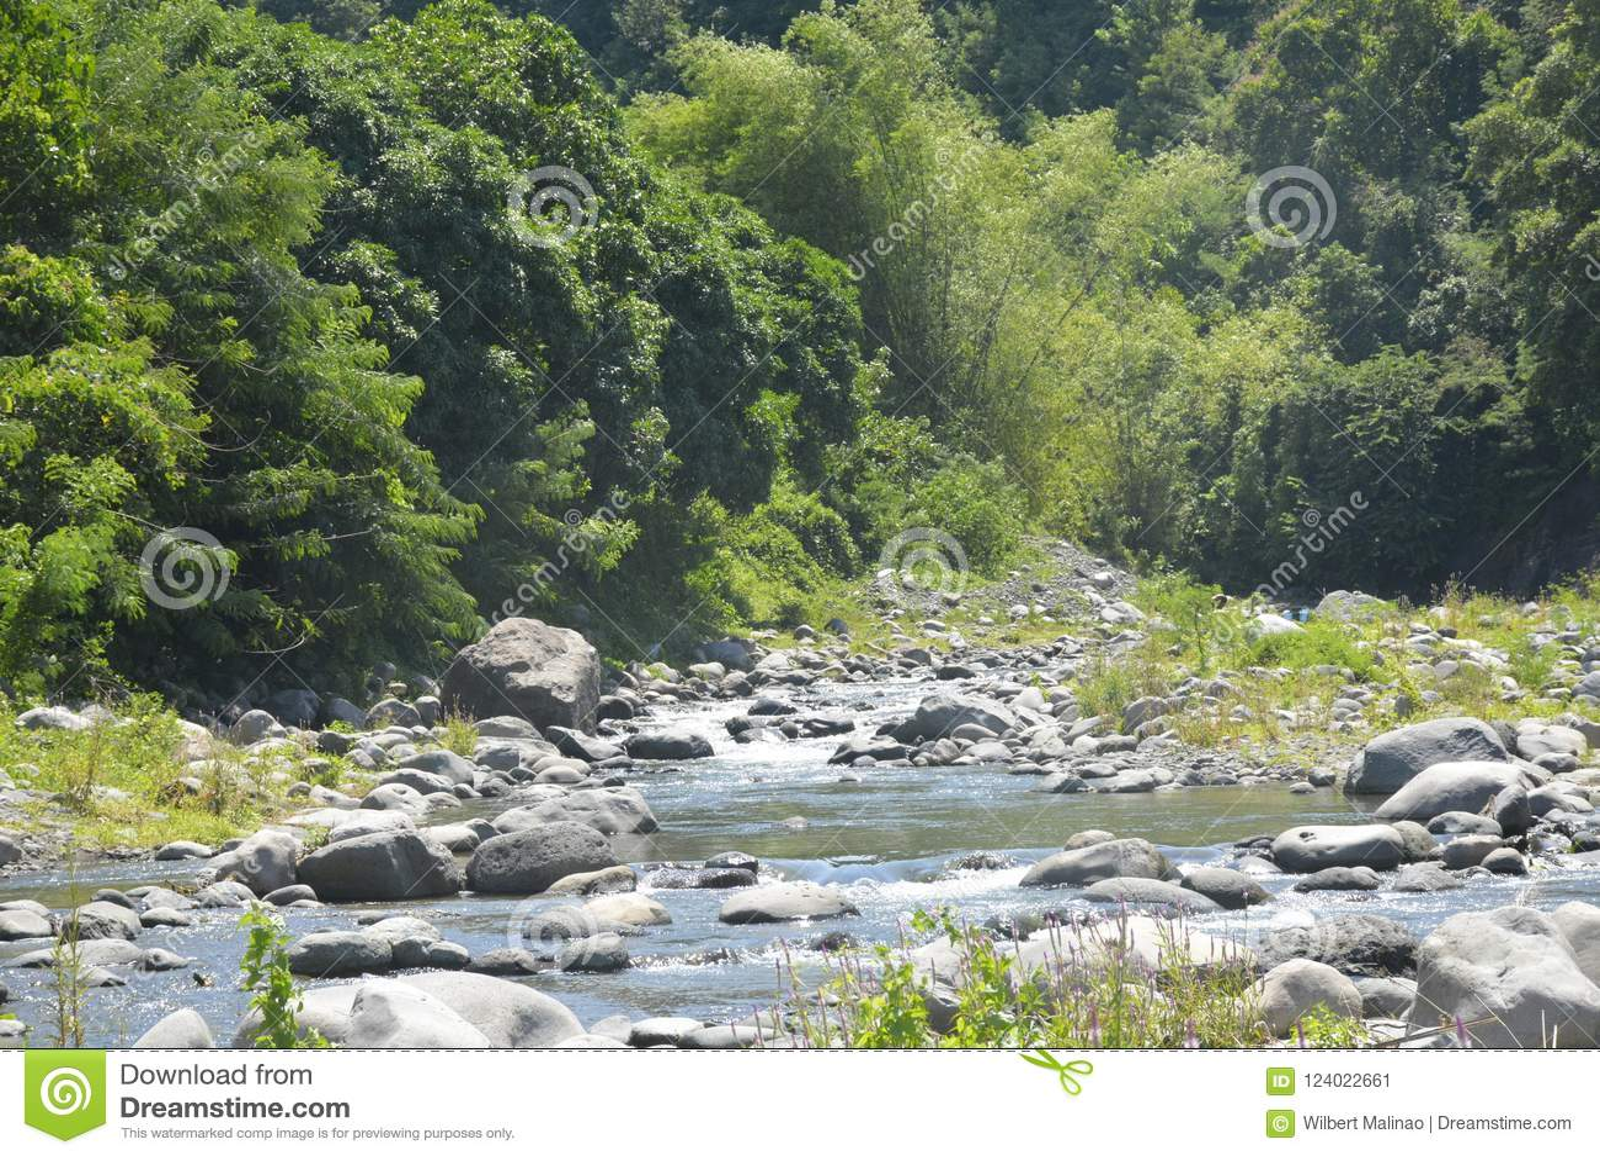 Ruparan河床位于barangay Ruparan, Digos市,南达沃省,菲律宾